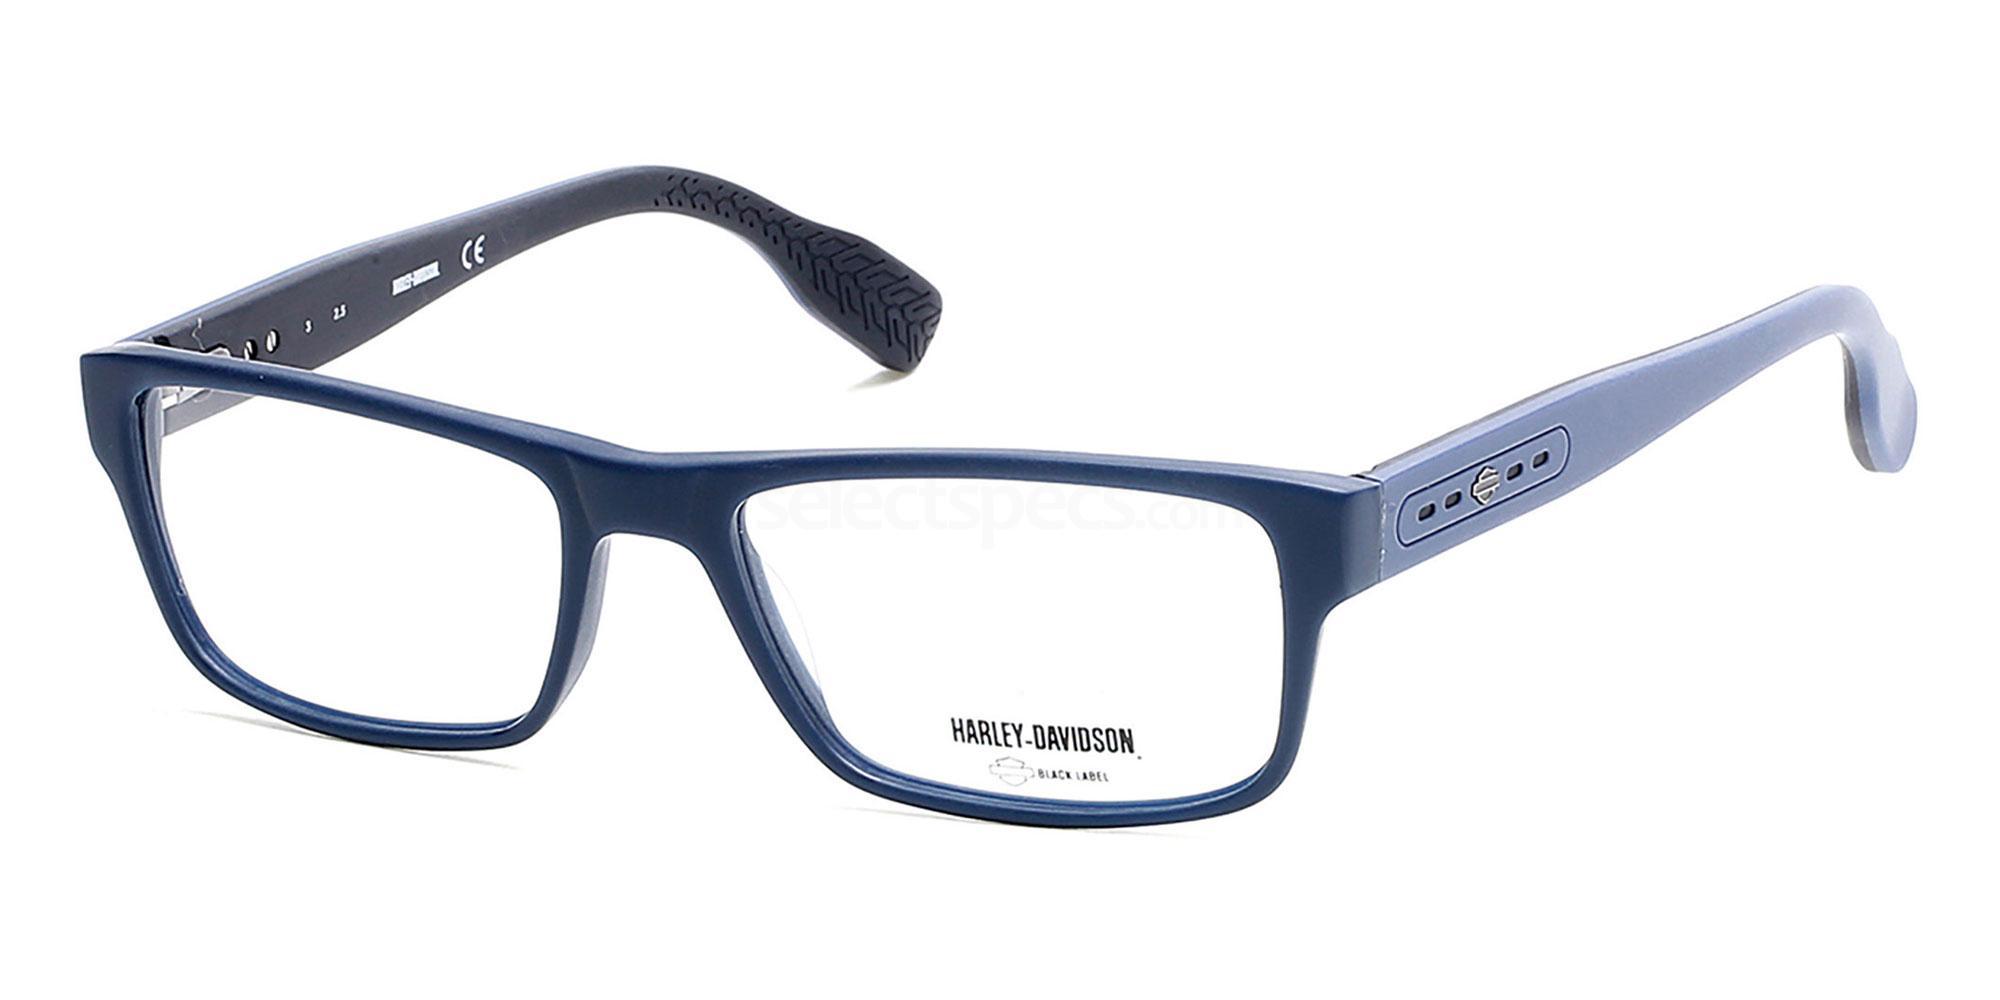 091 HD 1038 Glasses, Harley Davidson